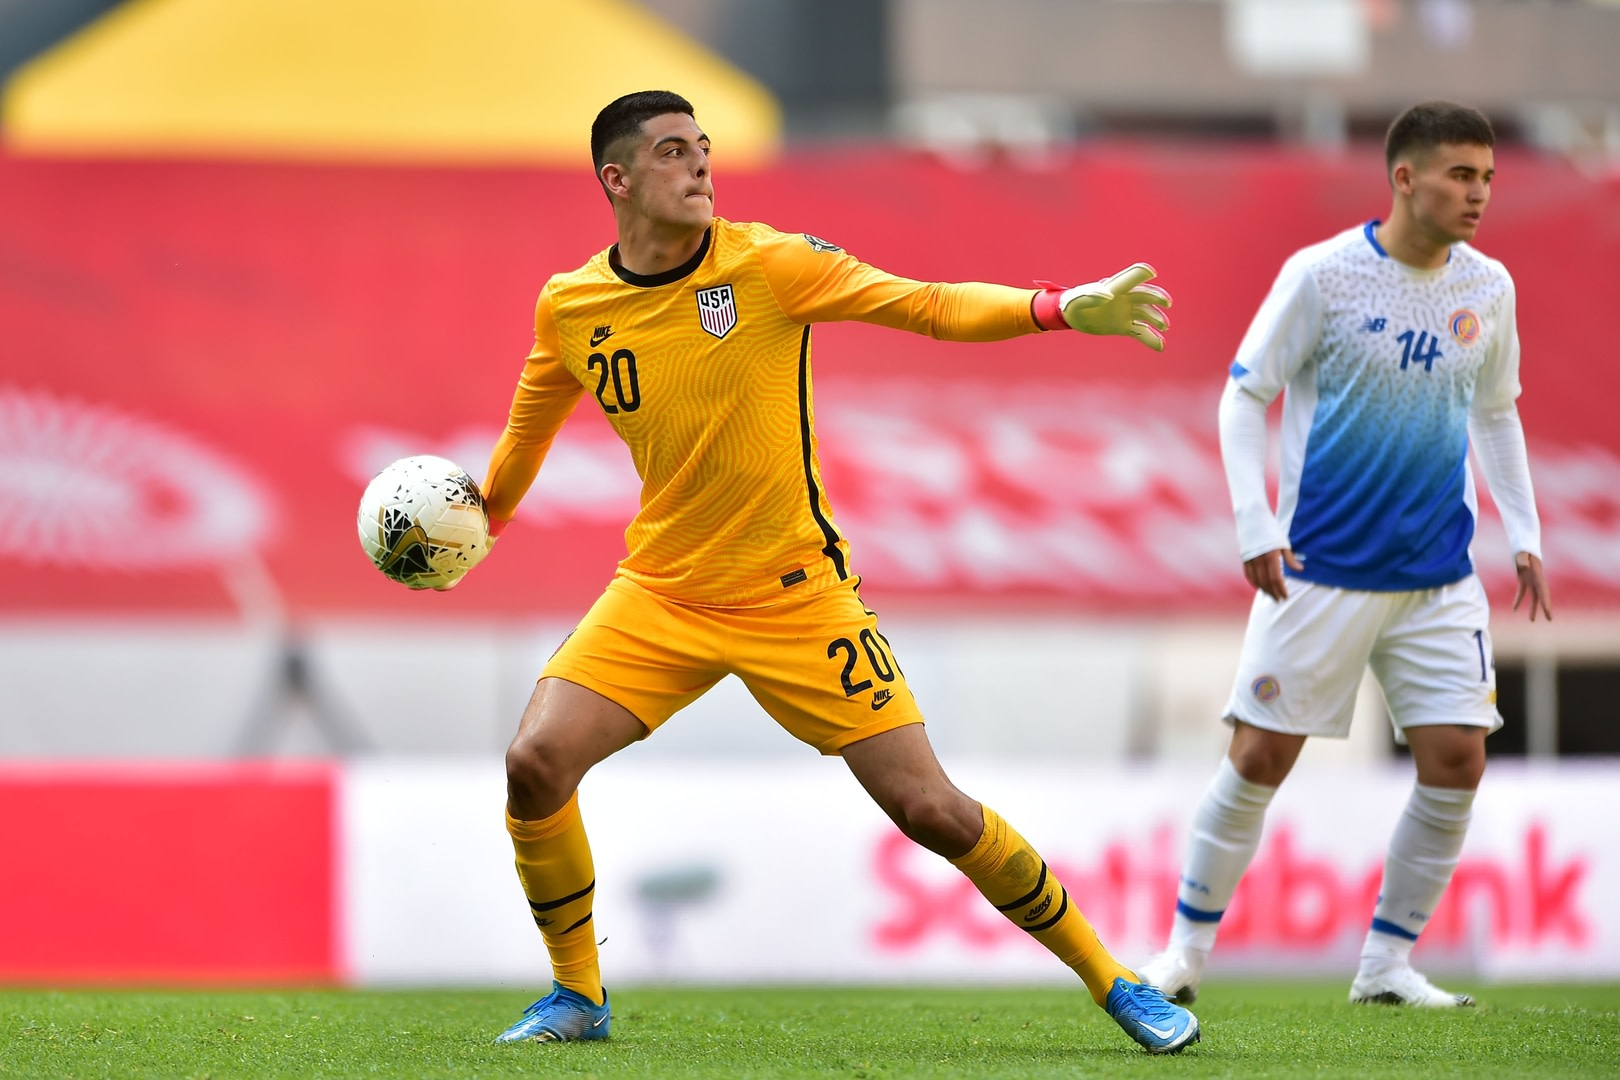 US U-23 coach Jason Kreis hails Real Salt Lake goalkeeper David Ochoa after huge match in Olympic Qualifying   MLSSoccer.com